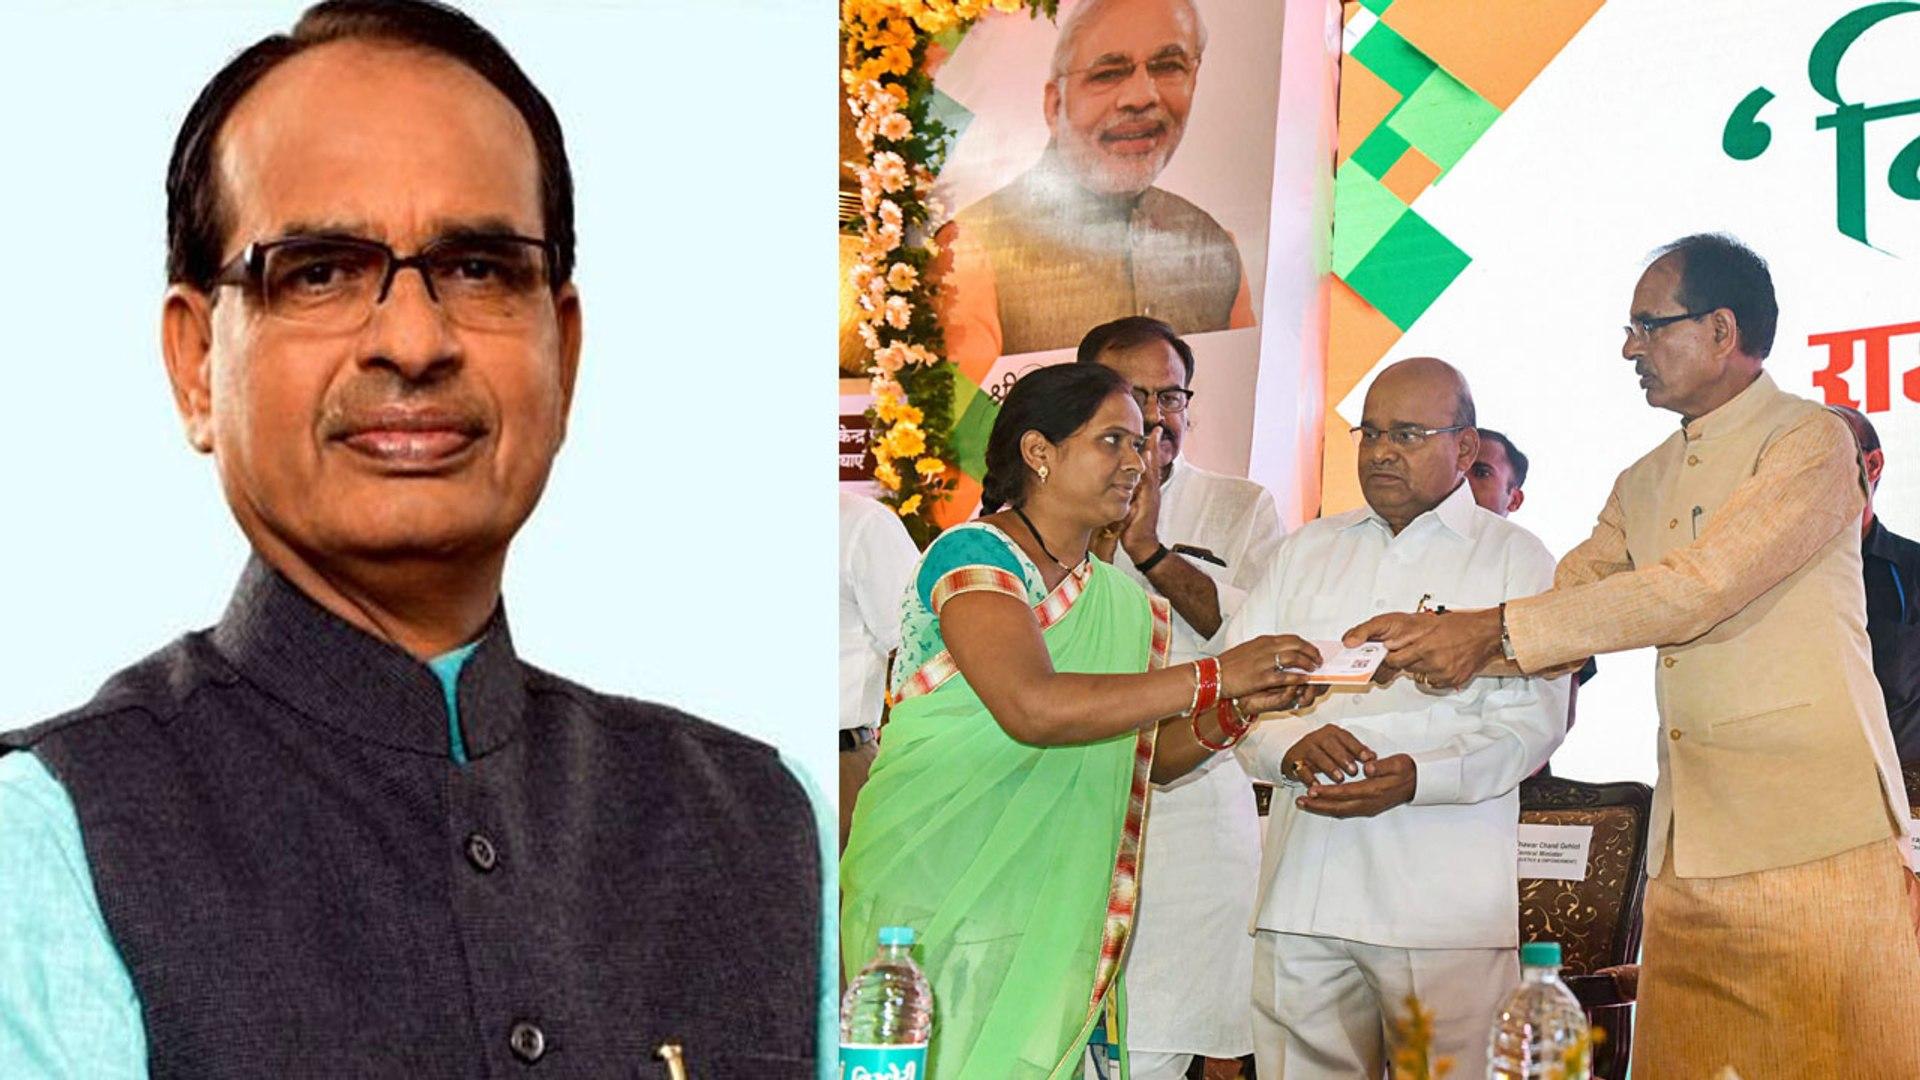 MP Election 2018: Ayushman Bharat Yojna पर Shivraj Singh ने कही ये बड़ी बात   वनइंडिया हिंदी - video Dailymotion